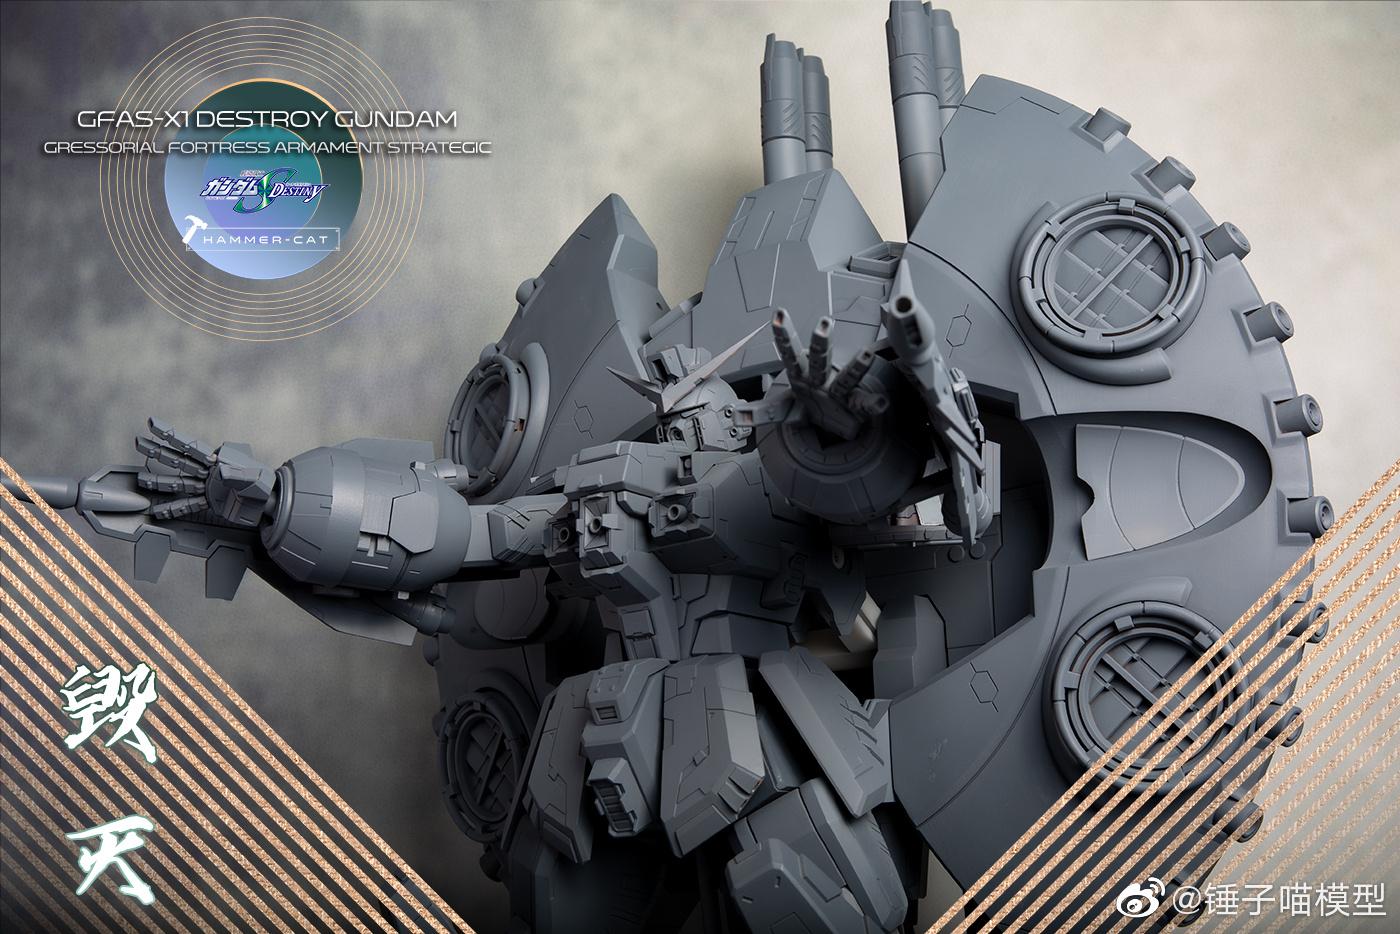 G744_GFAS_X1_Destroy_Gundam_005.jpg